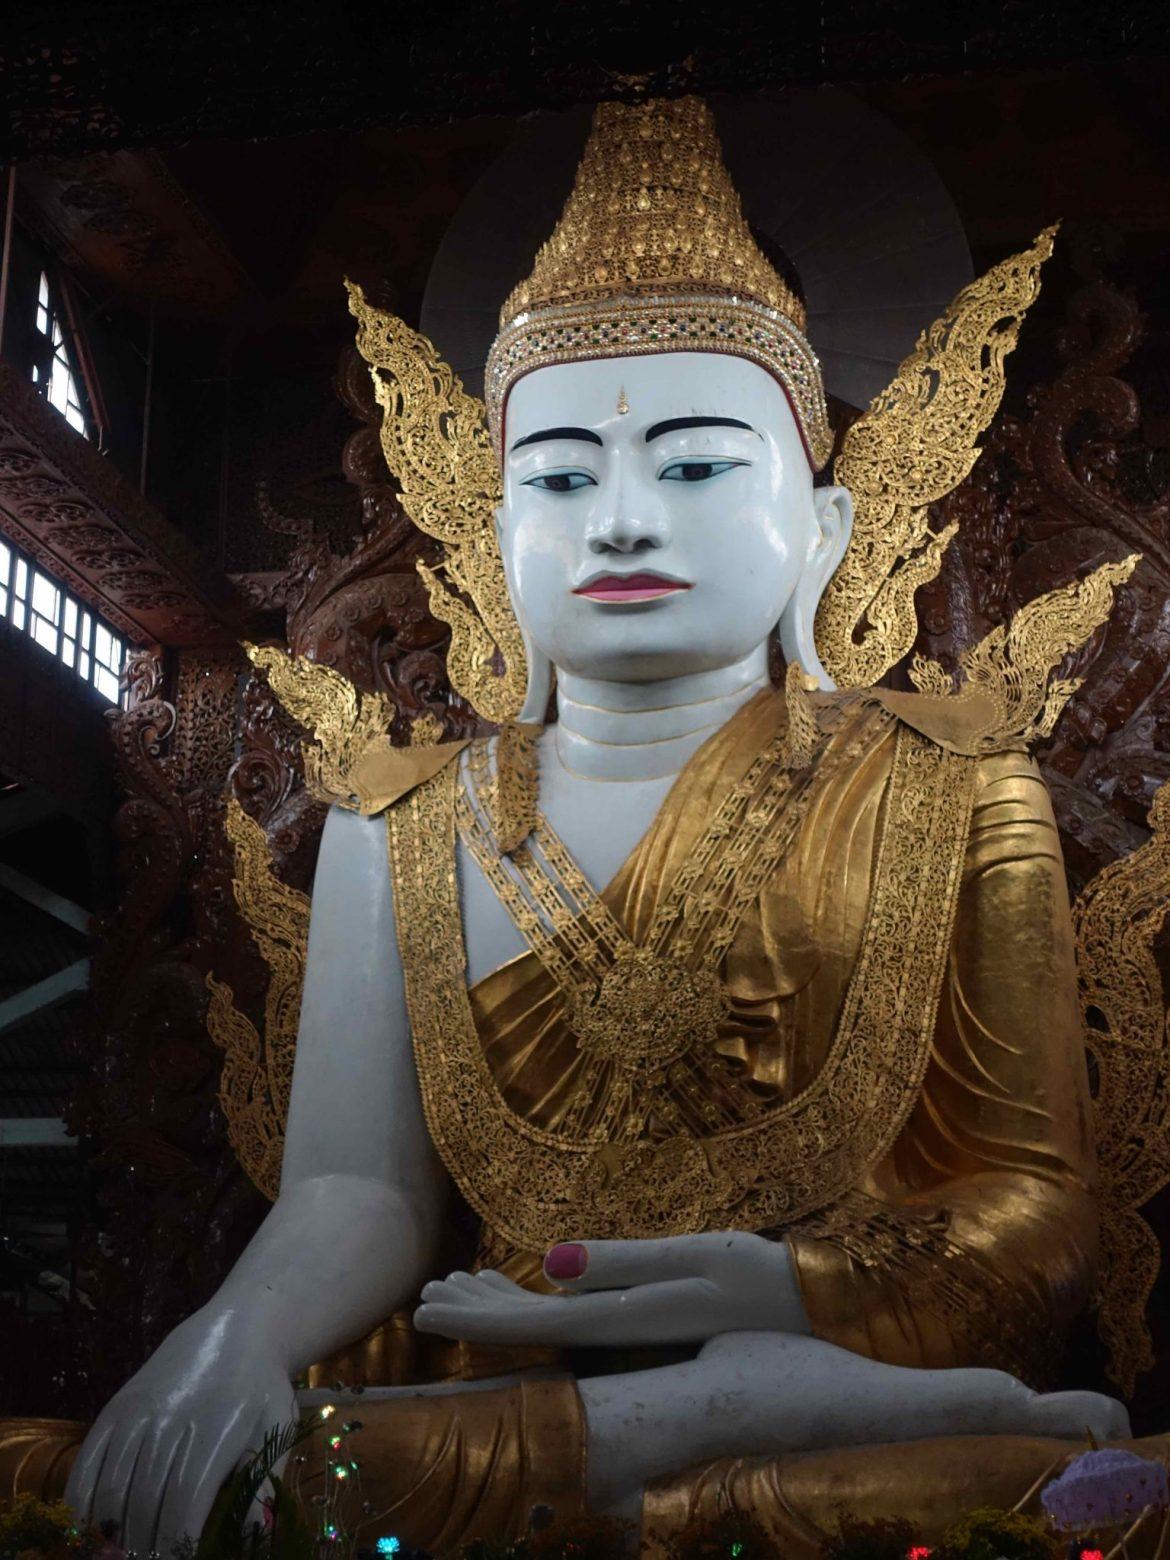 Ngahtatgyi Paya, Yangón